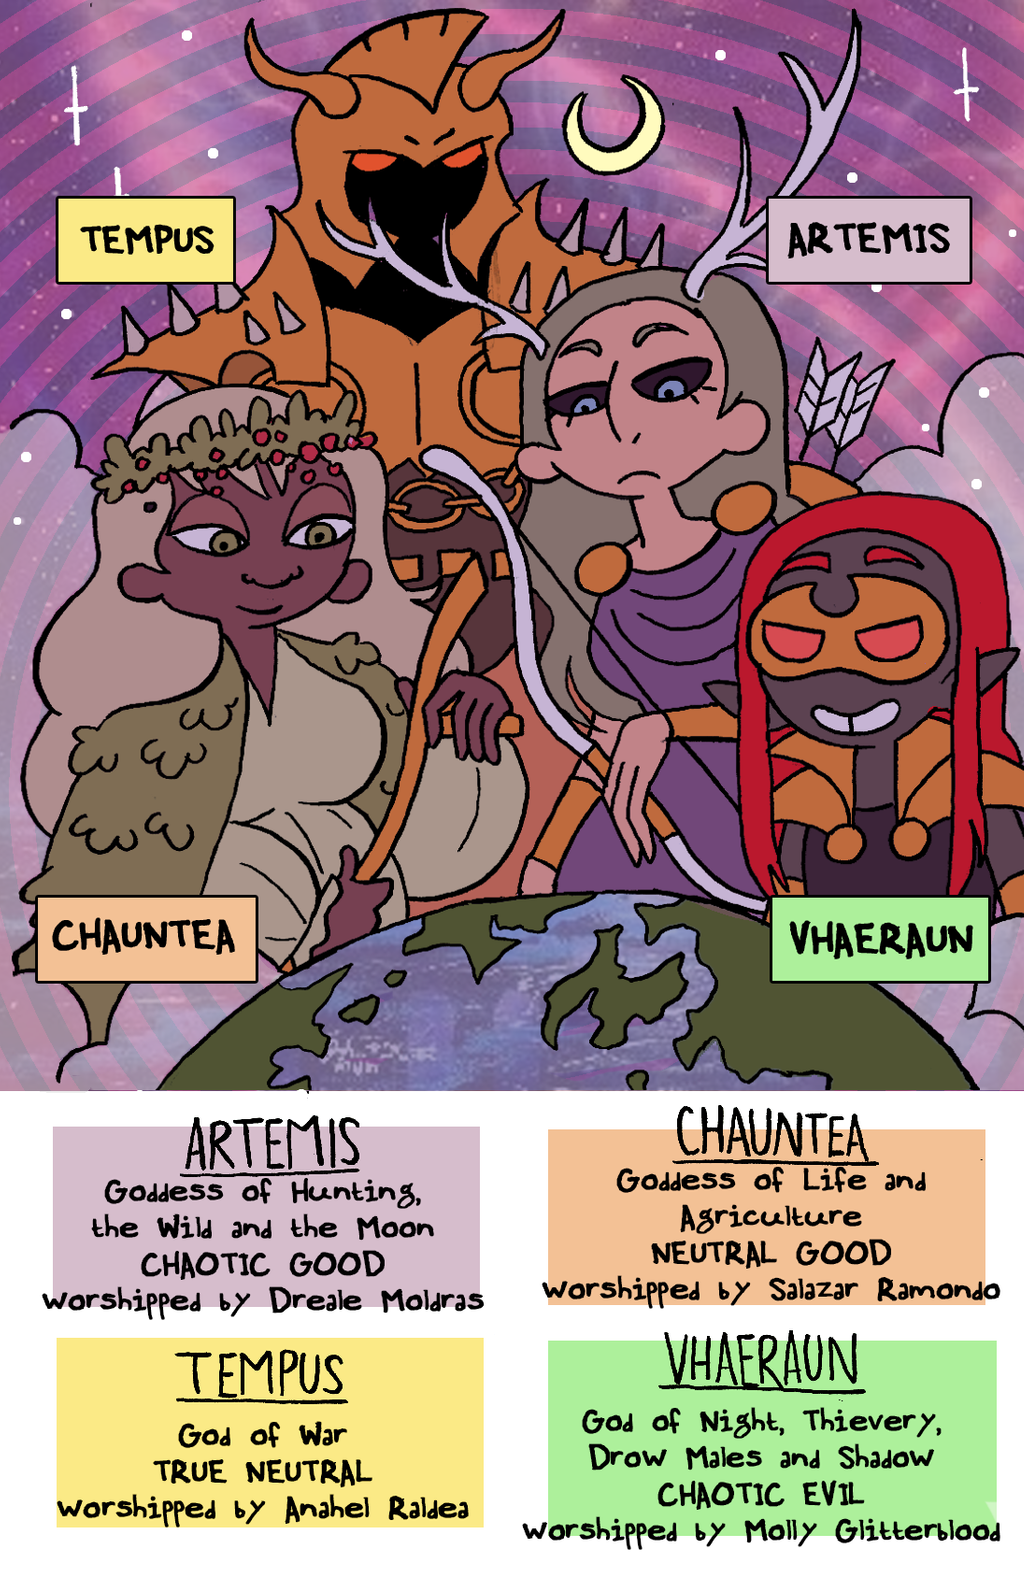 "zal001 ""Meet our Gods"", Artemis, Tempus, Chauntea e Vhaeraun - by Austin ""Zal"" Forbes www.deviantart.com/zal001 (2018) © dell'autore tutti i diritti riservati"